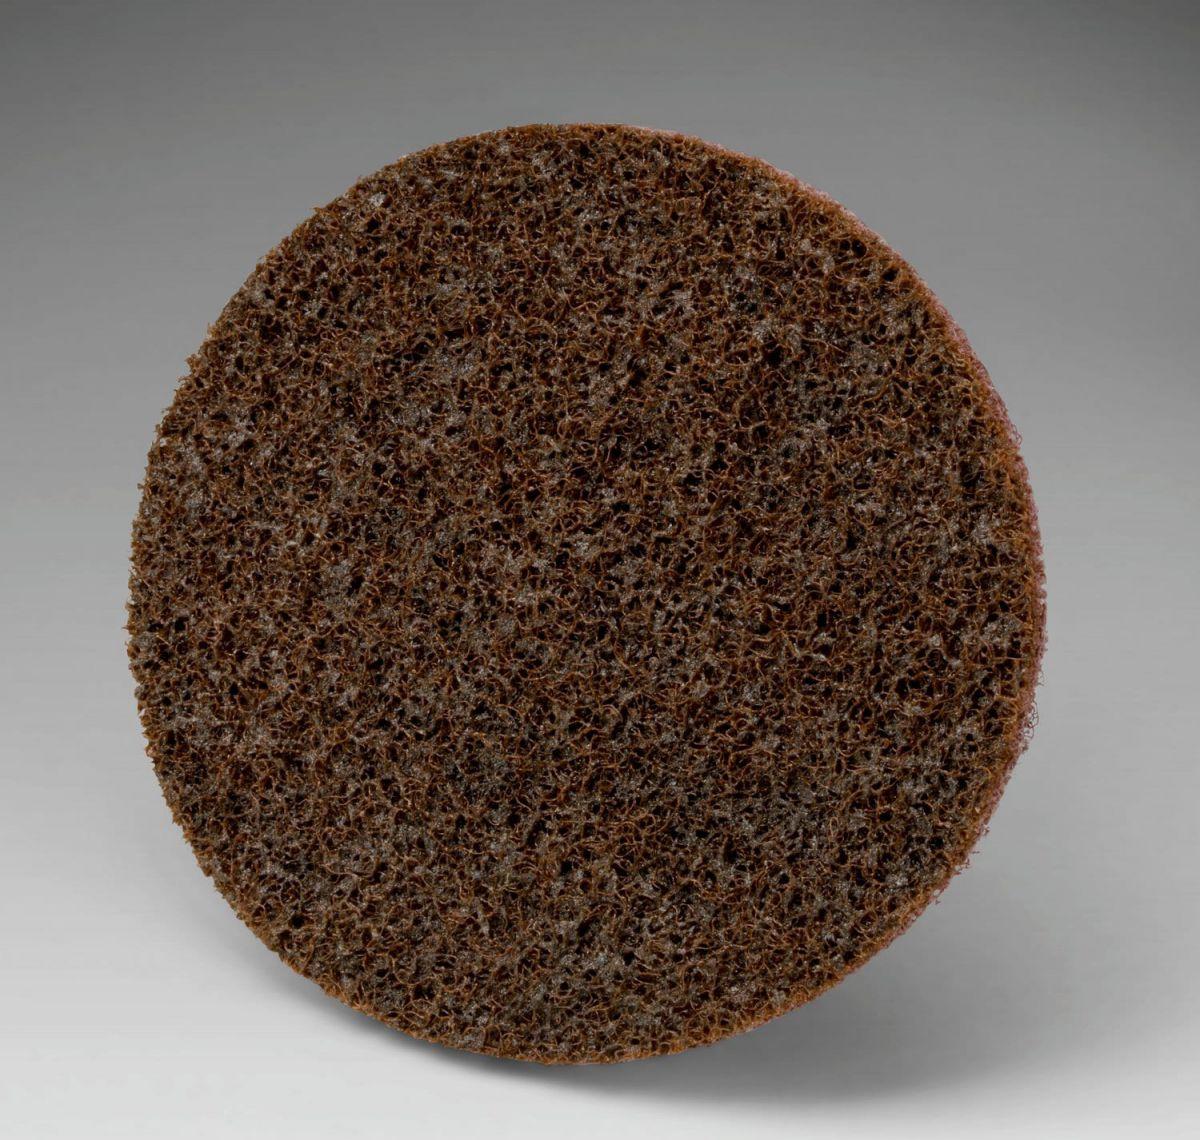 3m scotchbrite roloc surface conditioning schijf sldr zwart 50 mm a crs super duty pn337